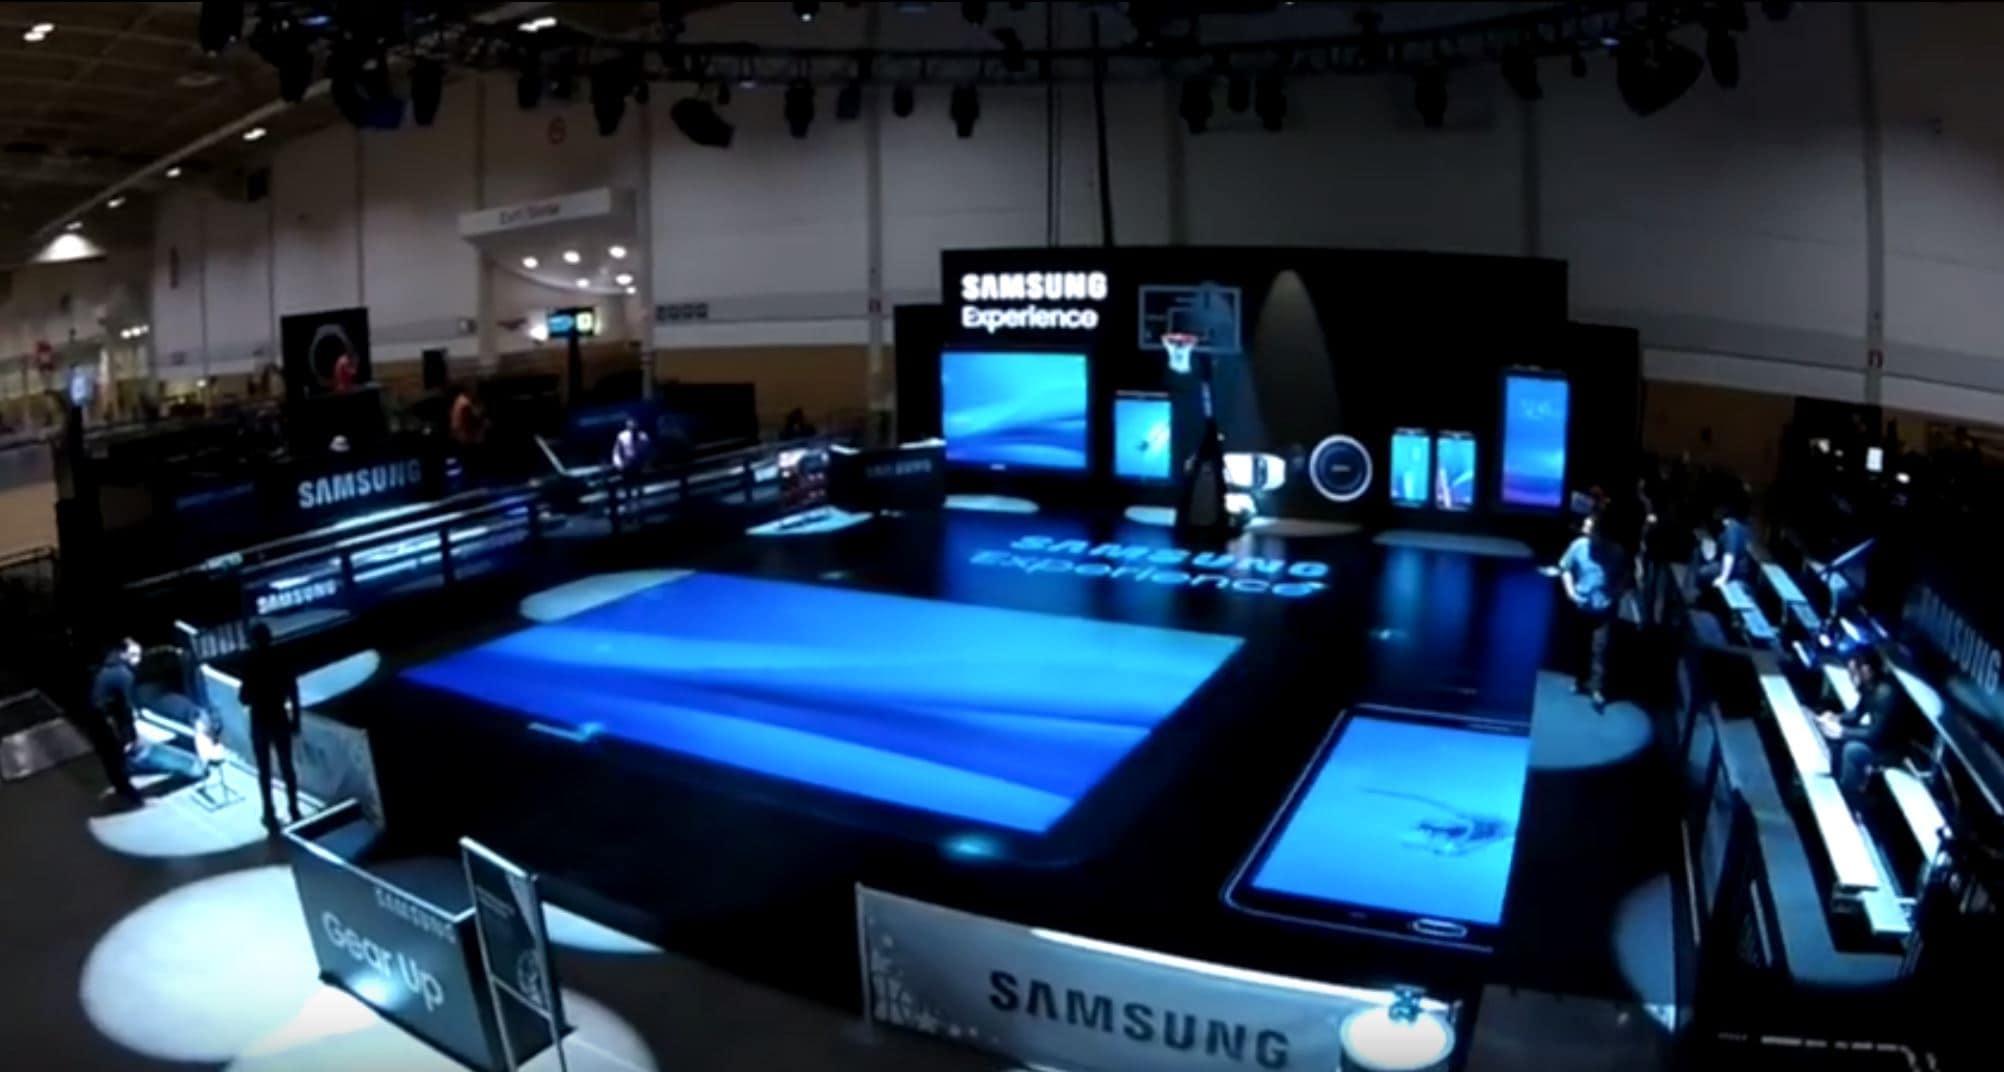 Samsung Trade Show Exhibit